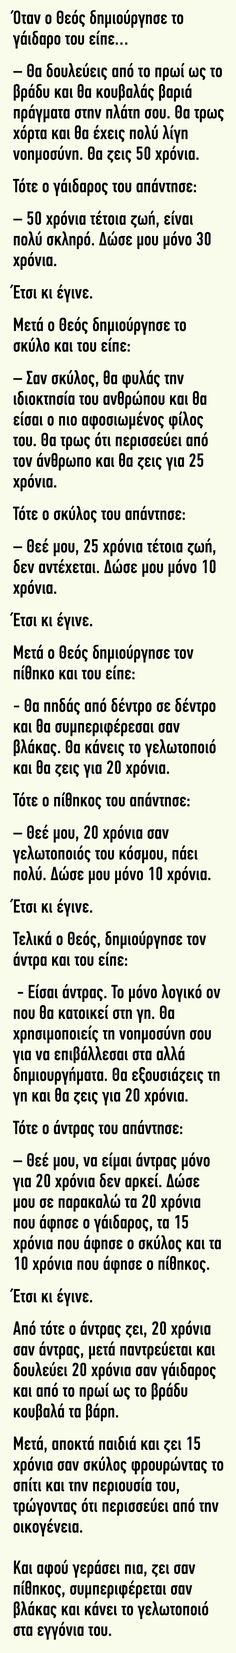 Funny Moments, Geek Stuff, Lol, Melancholy, Sayings, Memes, Quotes, Greece, Funny Stuff